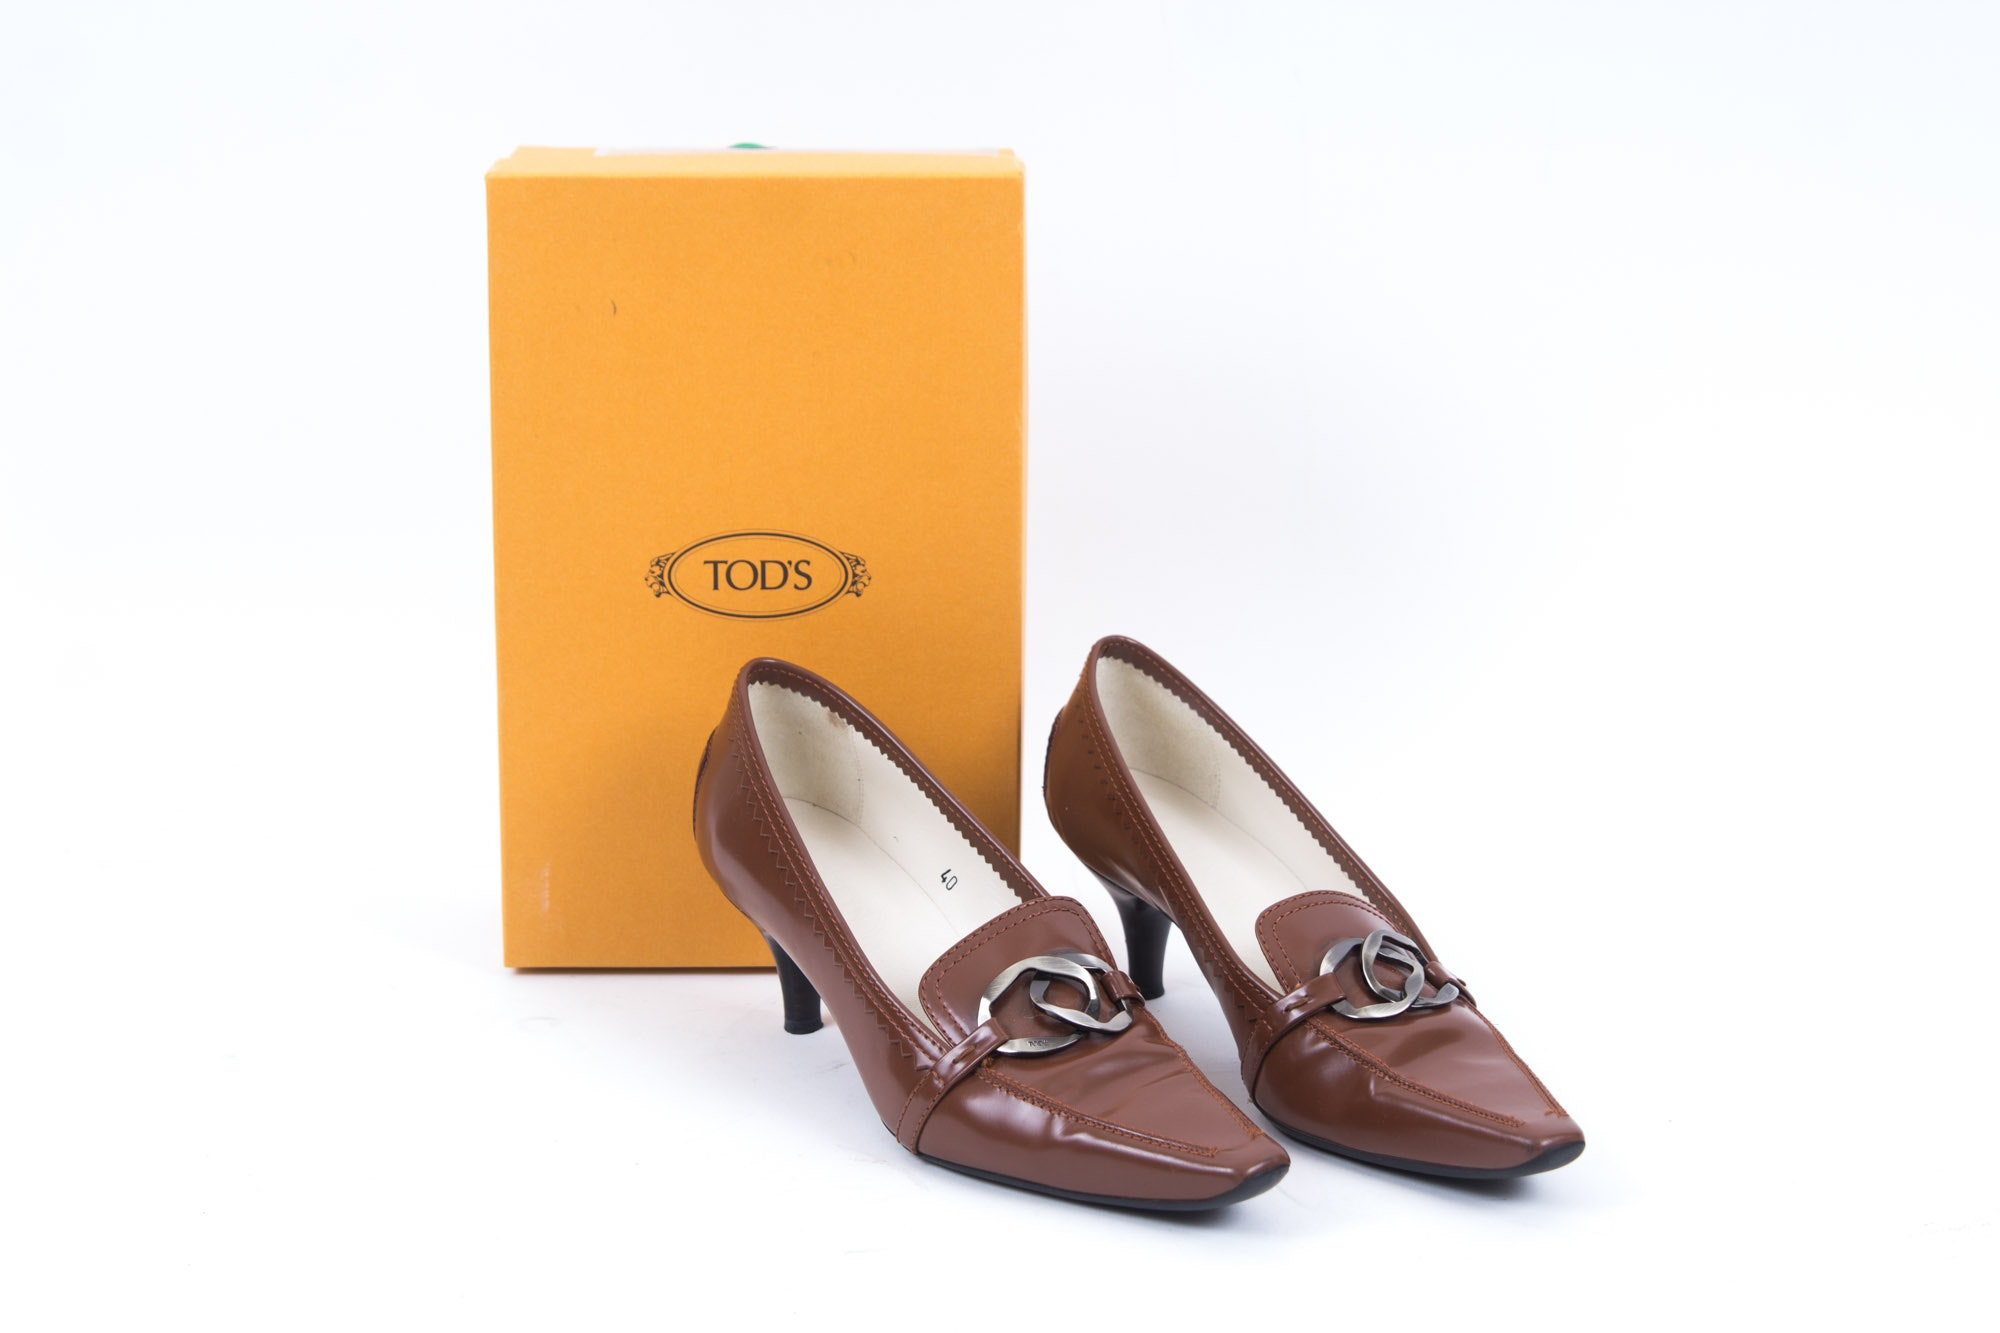 Tod's Brown Leather Kitten Heel Pumps